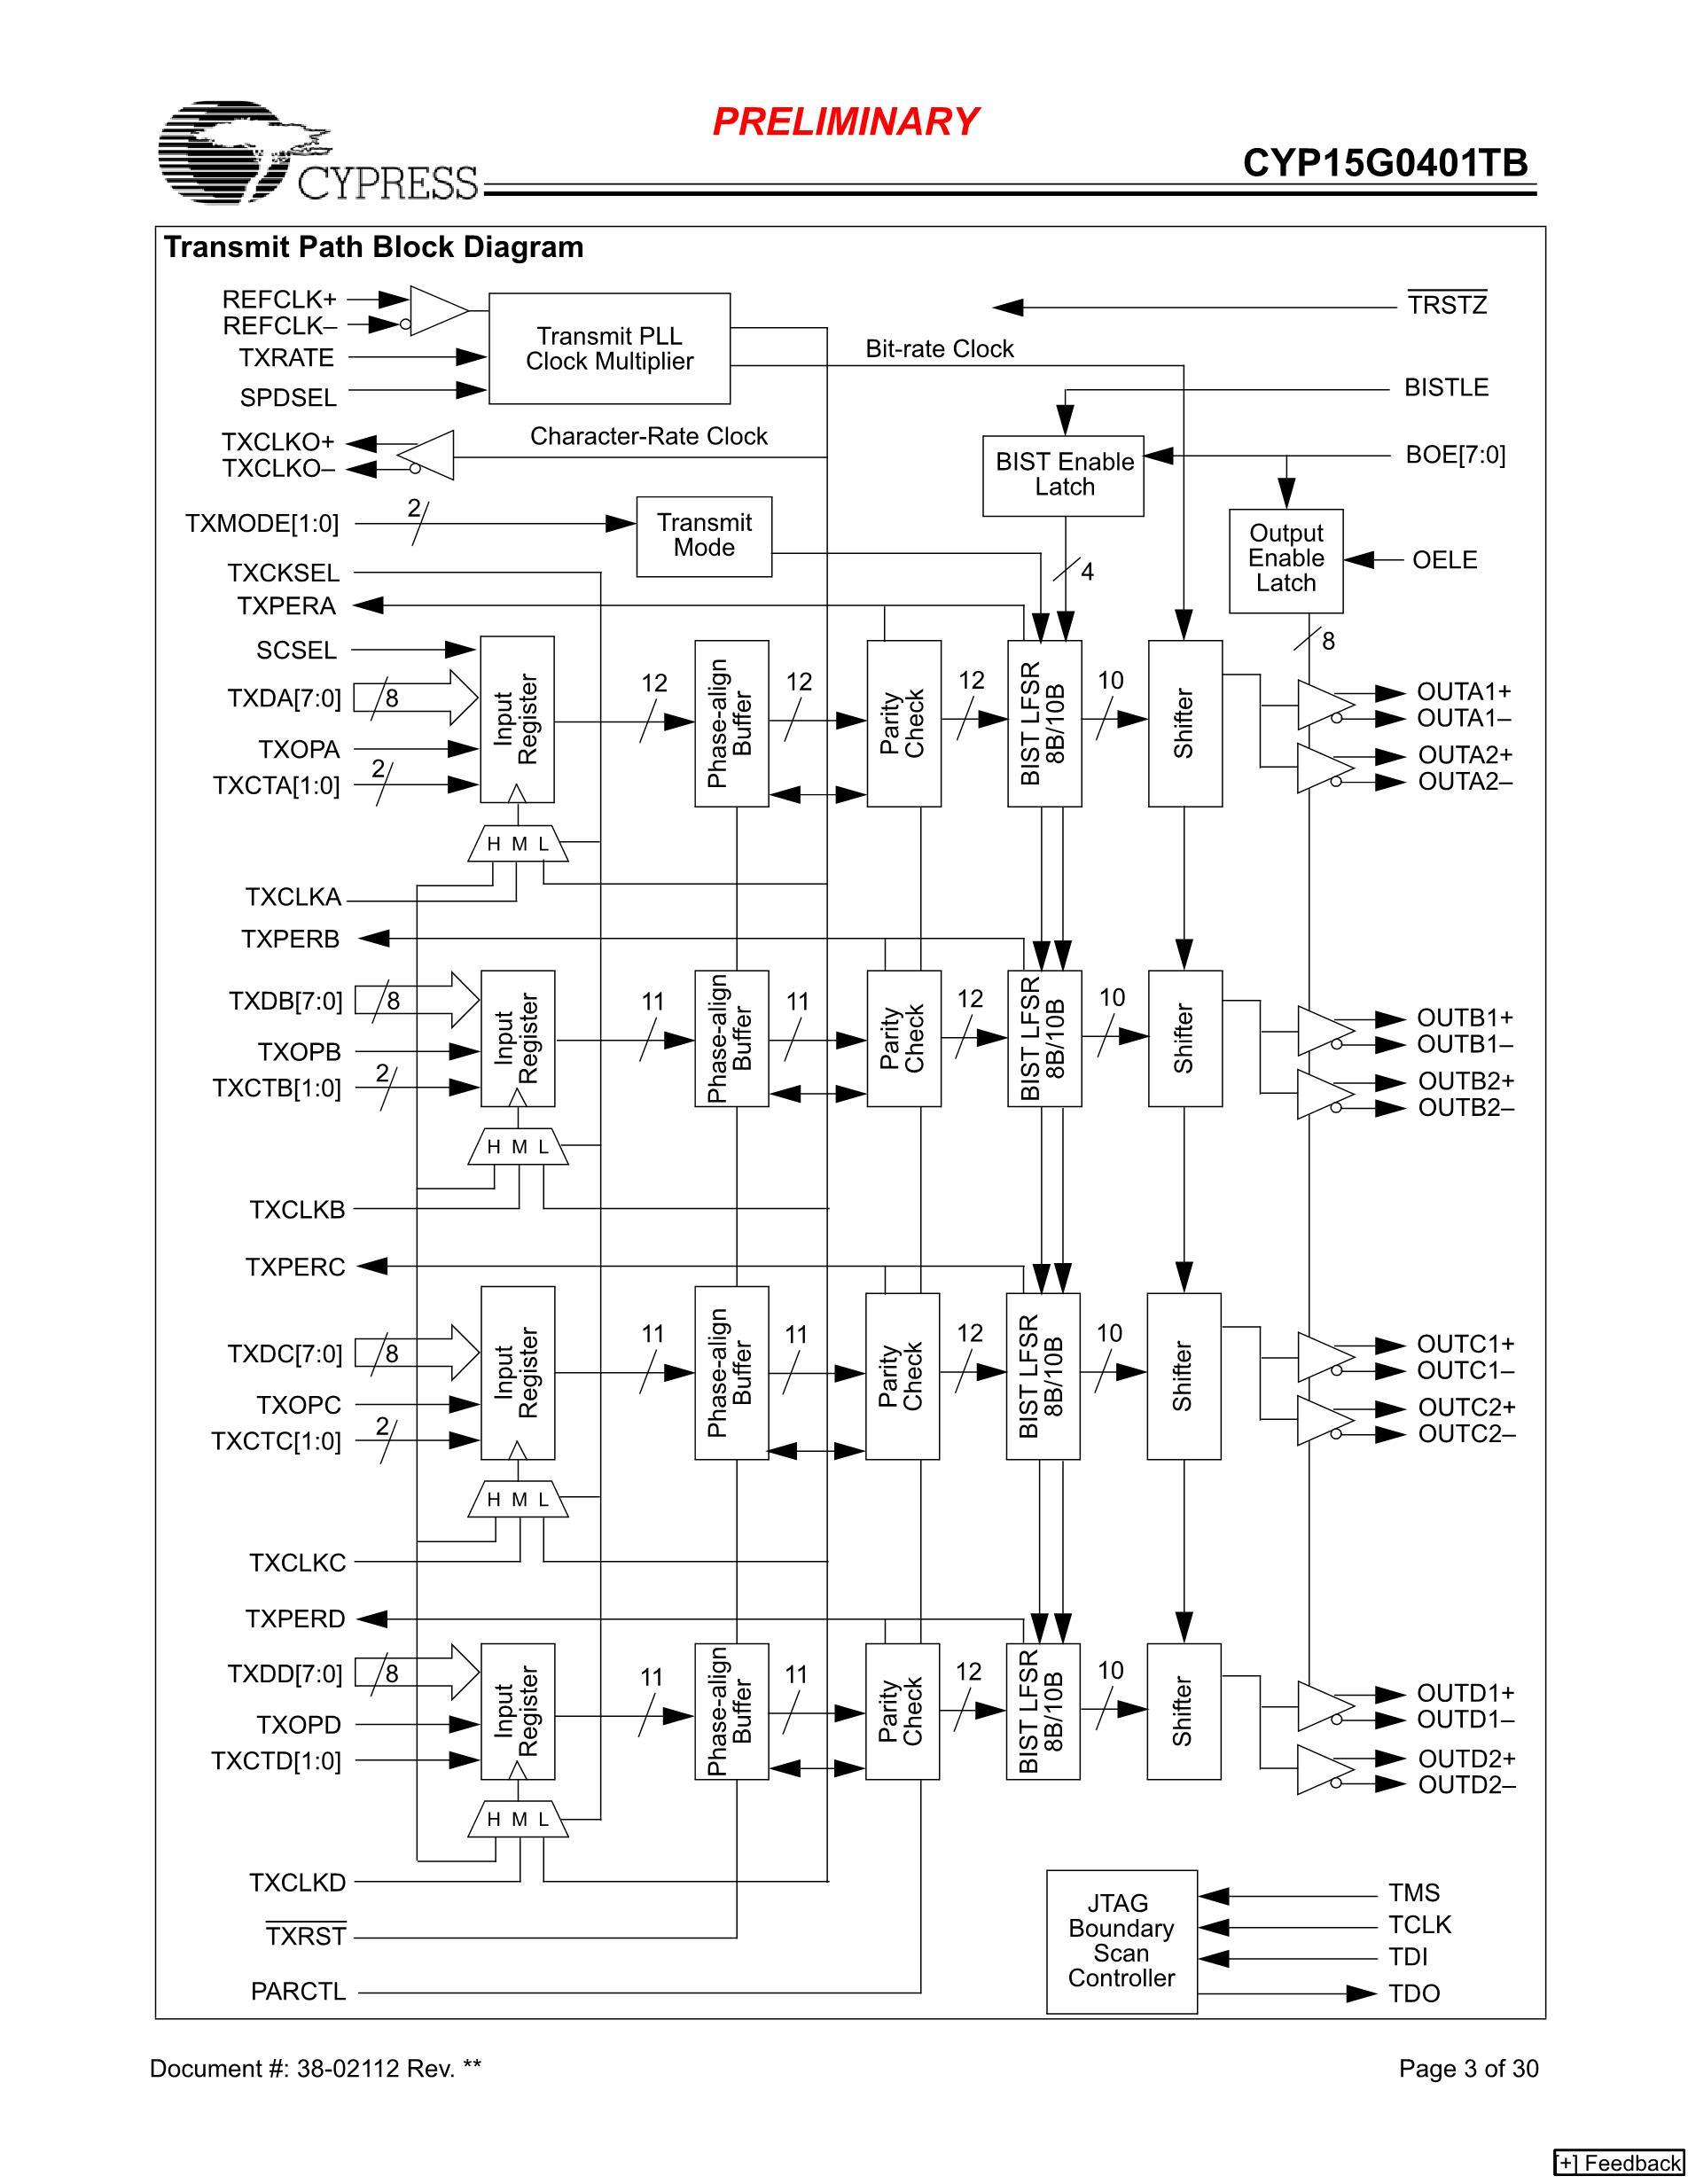 CYP15G0401RB-BGXC's pdf picture 3